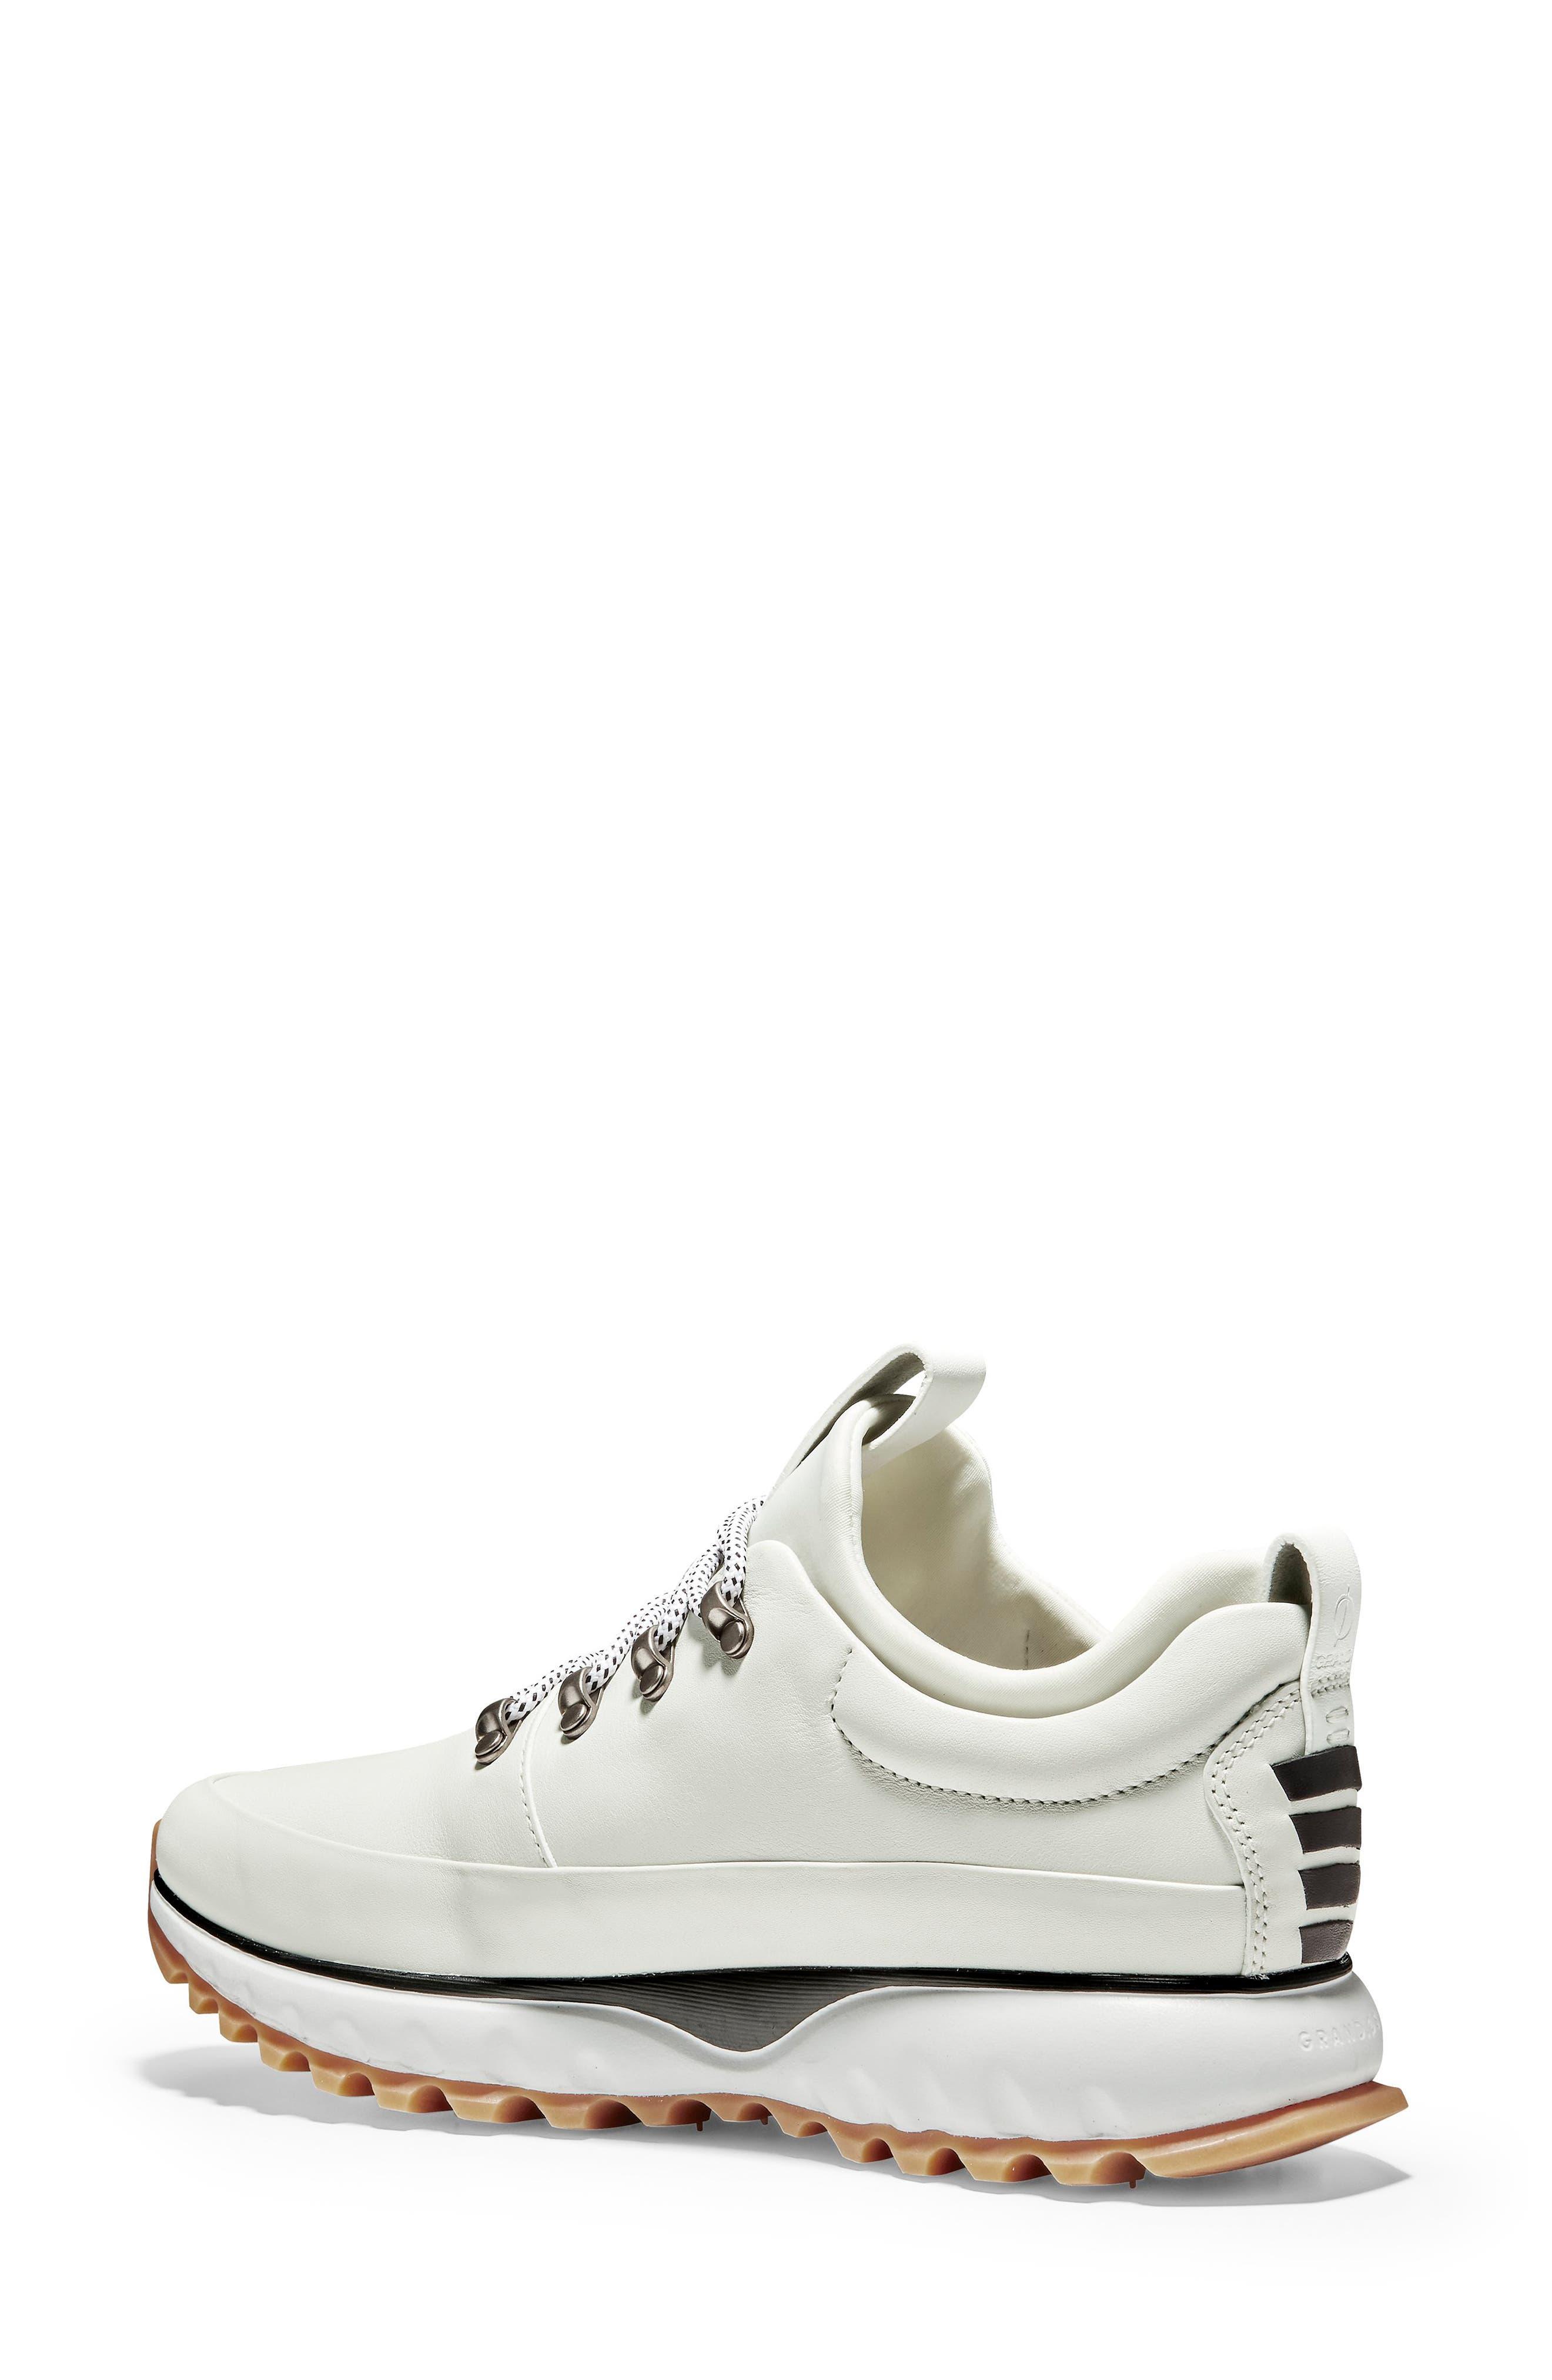 GrandExplore All Terrain Waterproof Sneaker,                             Alternate thumbnail 2, color,                             OPTIC WHITE WATERPROOF LEATHER